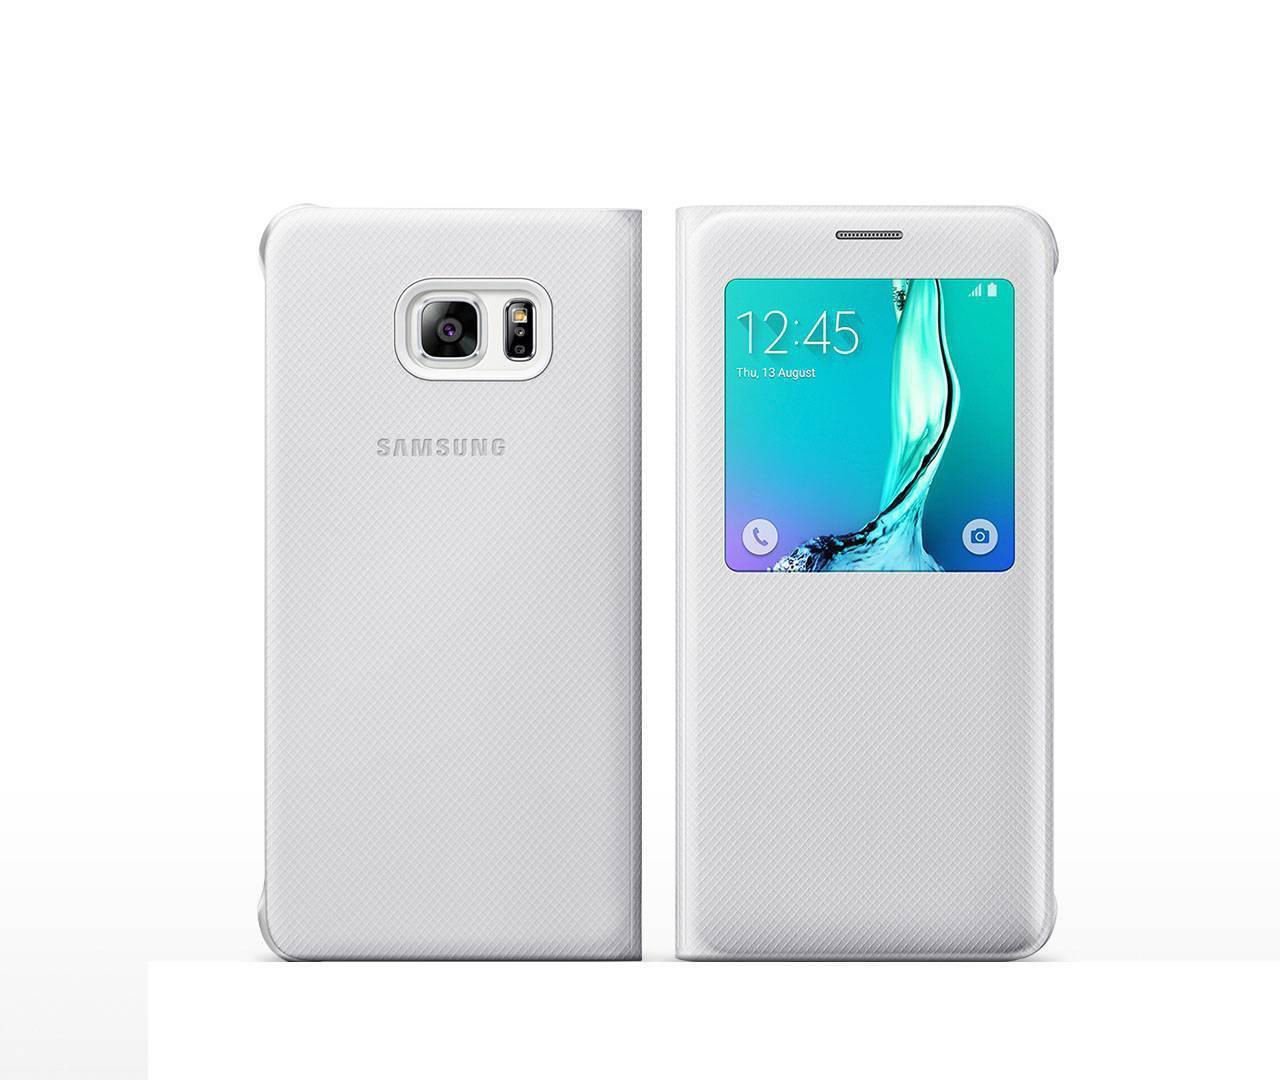 samsung galaxy s6 edge white. samsung s view cover case for galaxy s6 edge plus | walmart canada white l